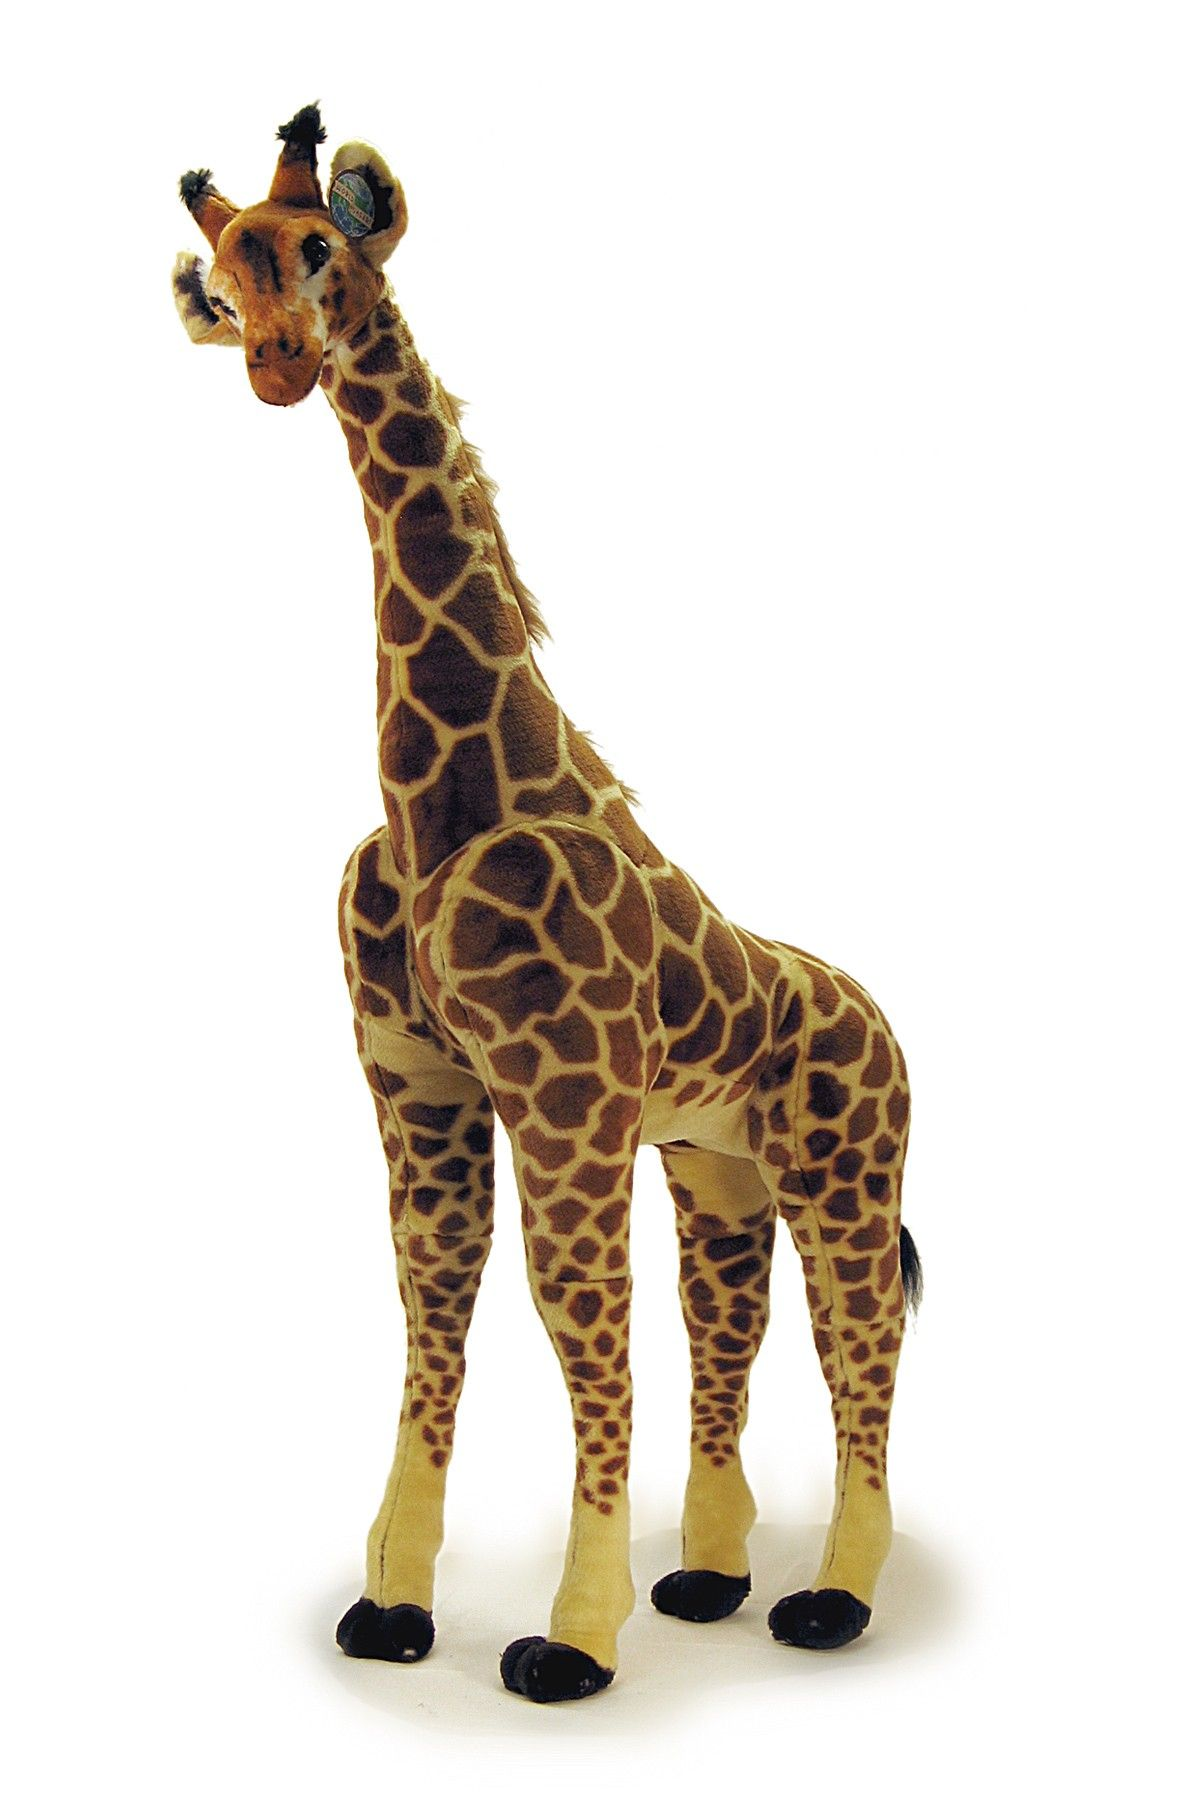 Hautelook Warehouse 36 58 Giraffe Giant Giraffe Giraffe Art [ 1800 x 1200 Pixel ]